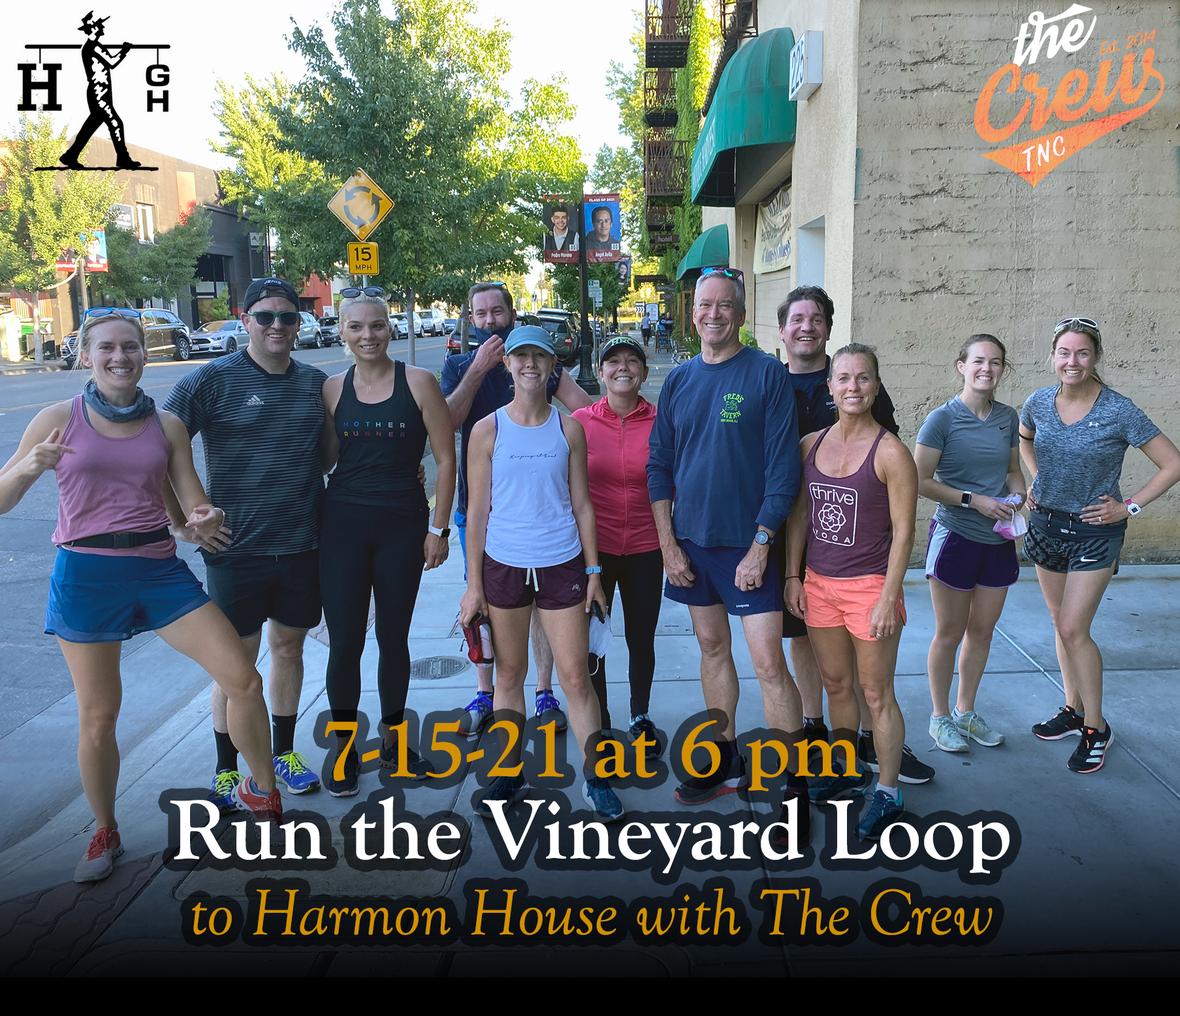 harmon house runners